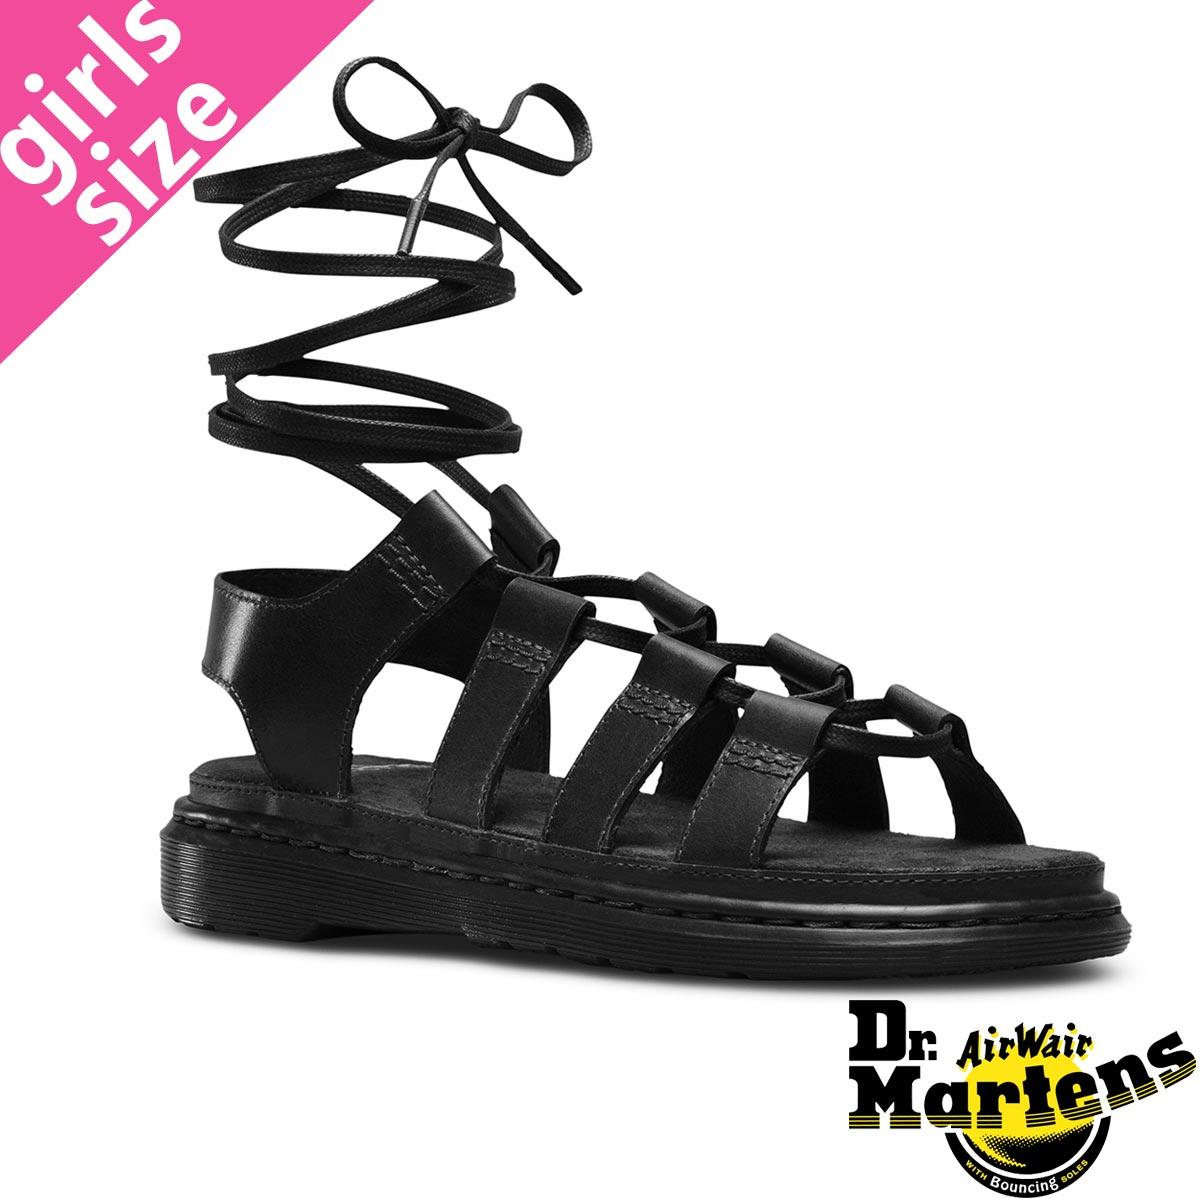 7ec341292ff ... クリスティーナ ギリー サンダル BLACK:LOWTEX ビッグ・スモール店 送料無料  Dr.Martensドクターマーチン レディース  靴 サンダル ブラック 黒 24140001